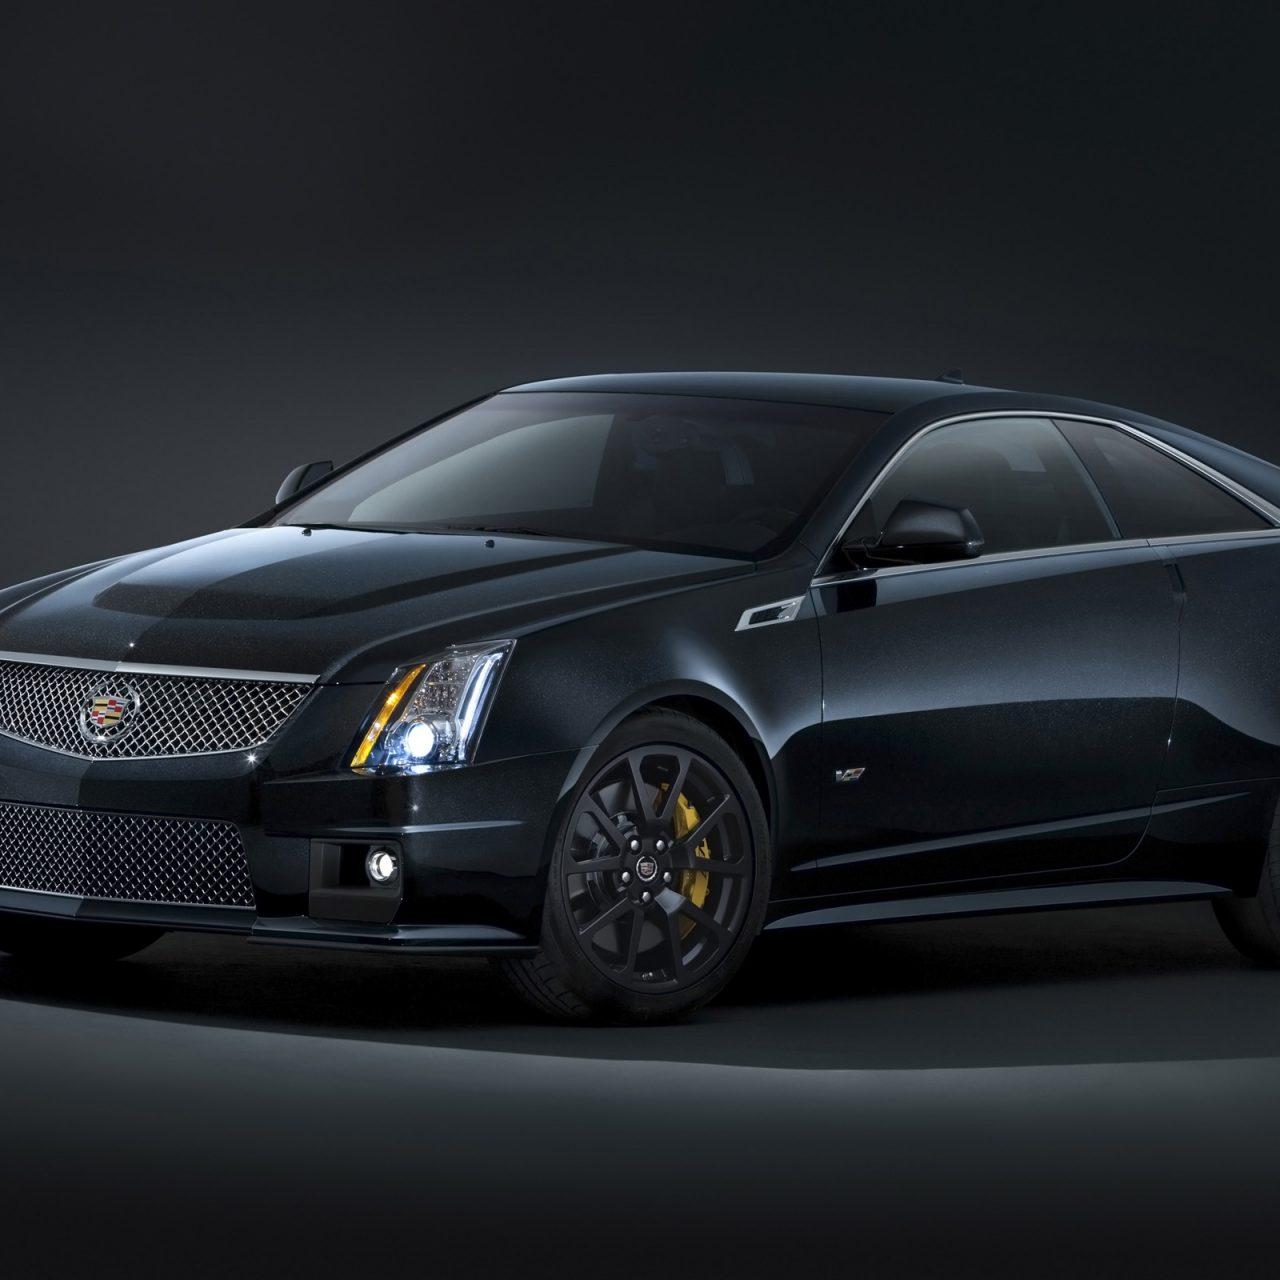 Cadillac CTS-V Coupe 2014 01 (Black) HD Wallpaper